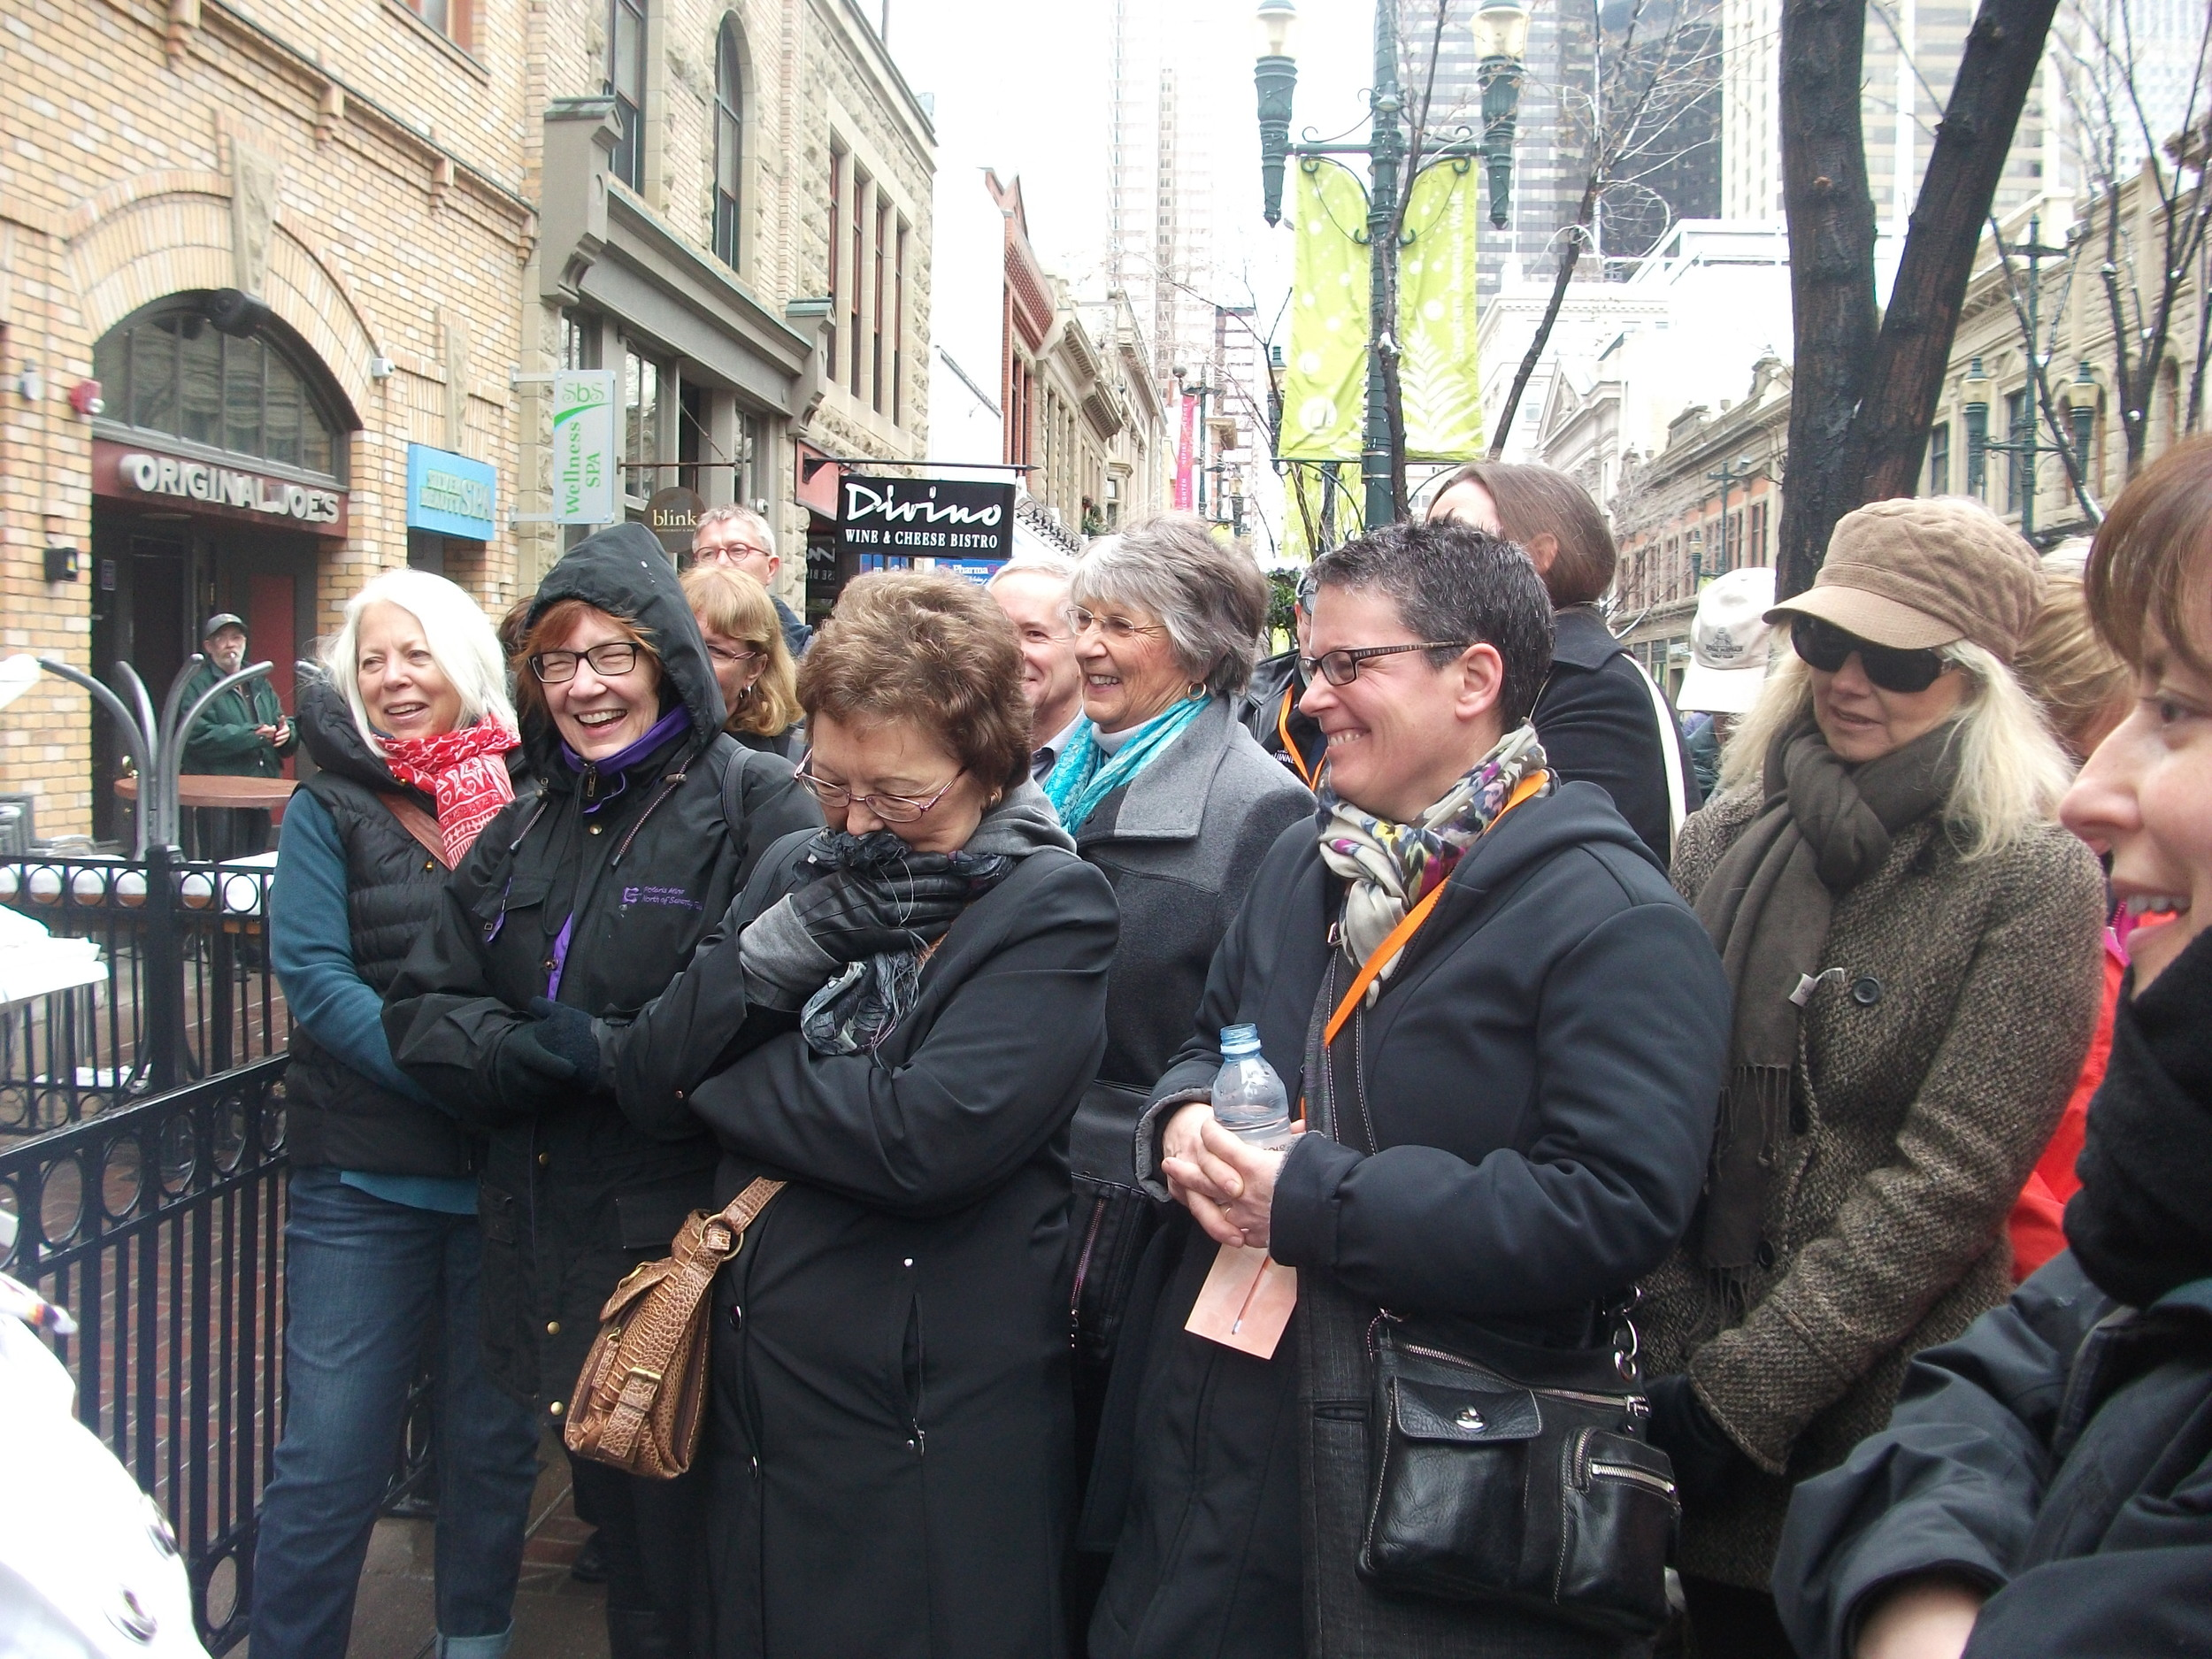 Myrna Kostash warms the crowd with her take on Laura Salverson's fierce Icelandic patriotism.